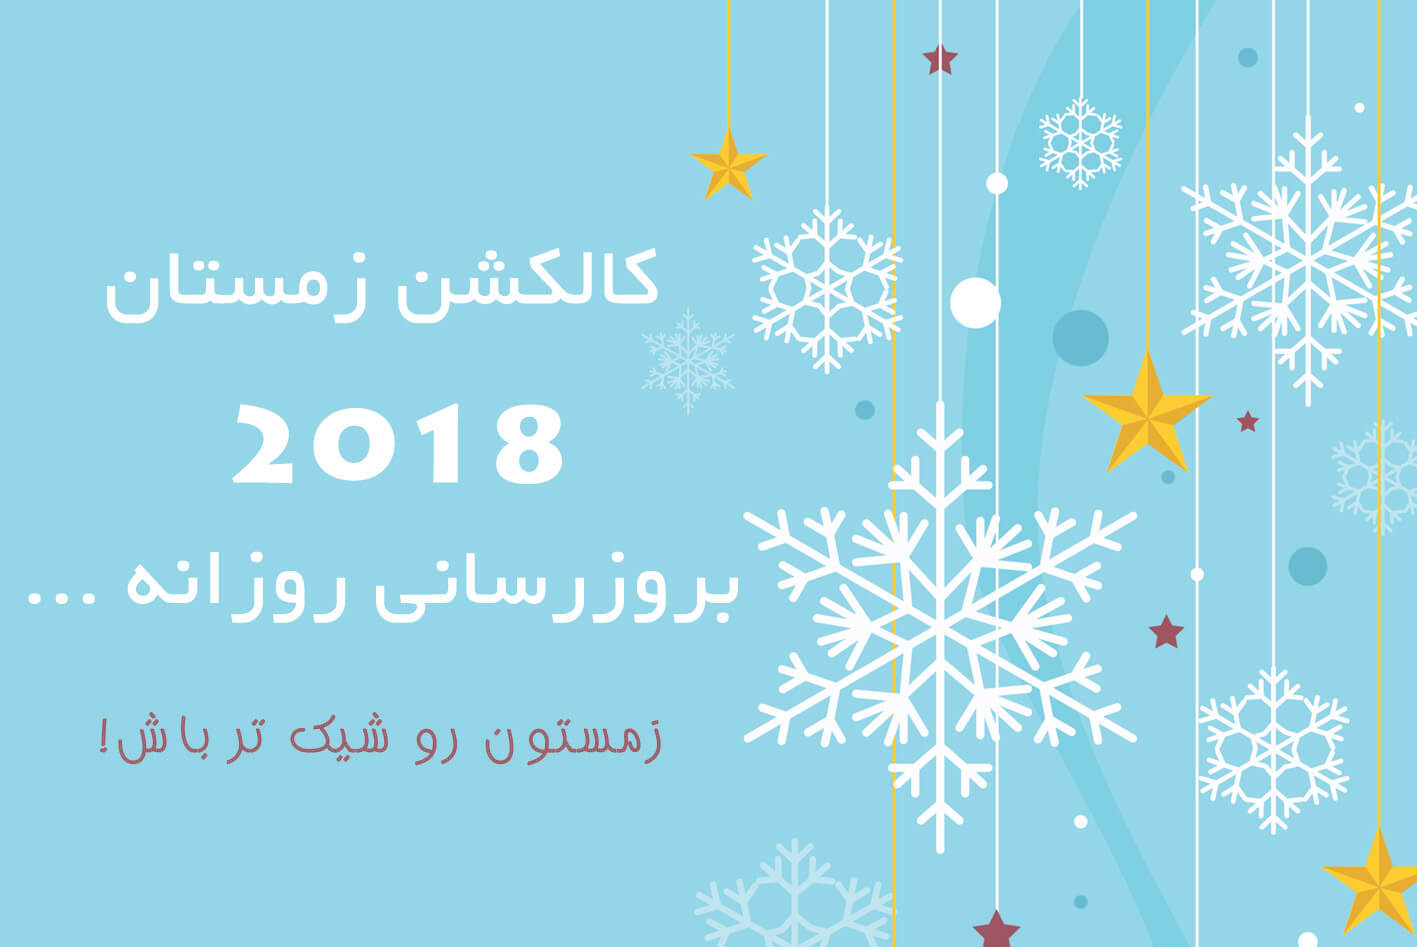 کالکشن زیورآلات زمستان 2018 گالری شمرون